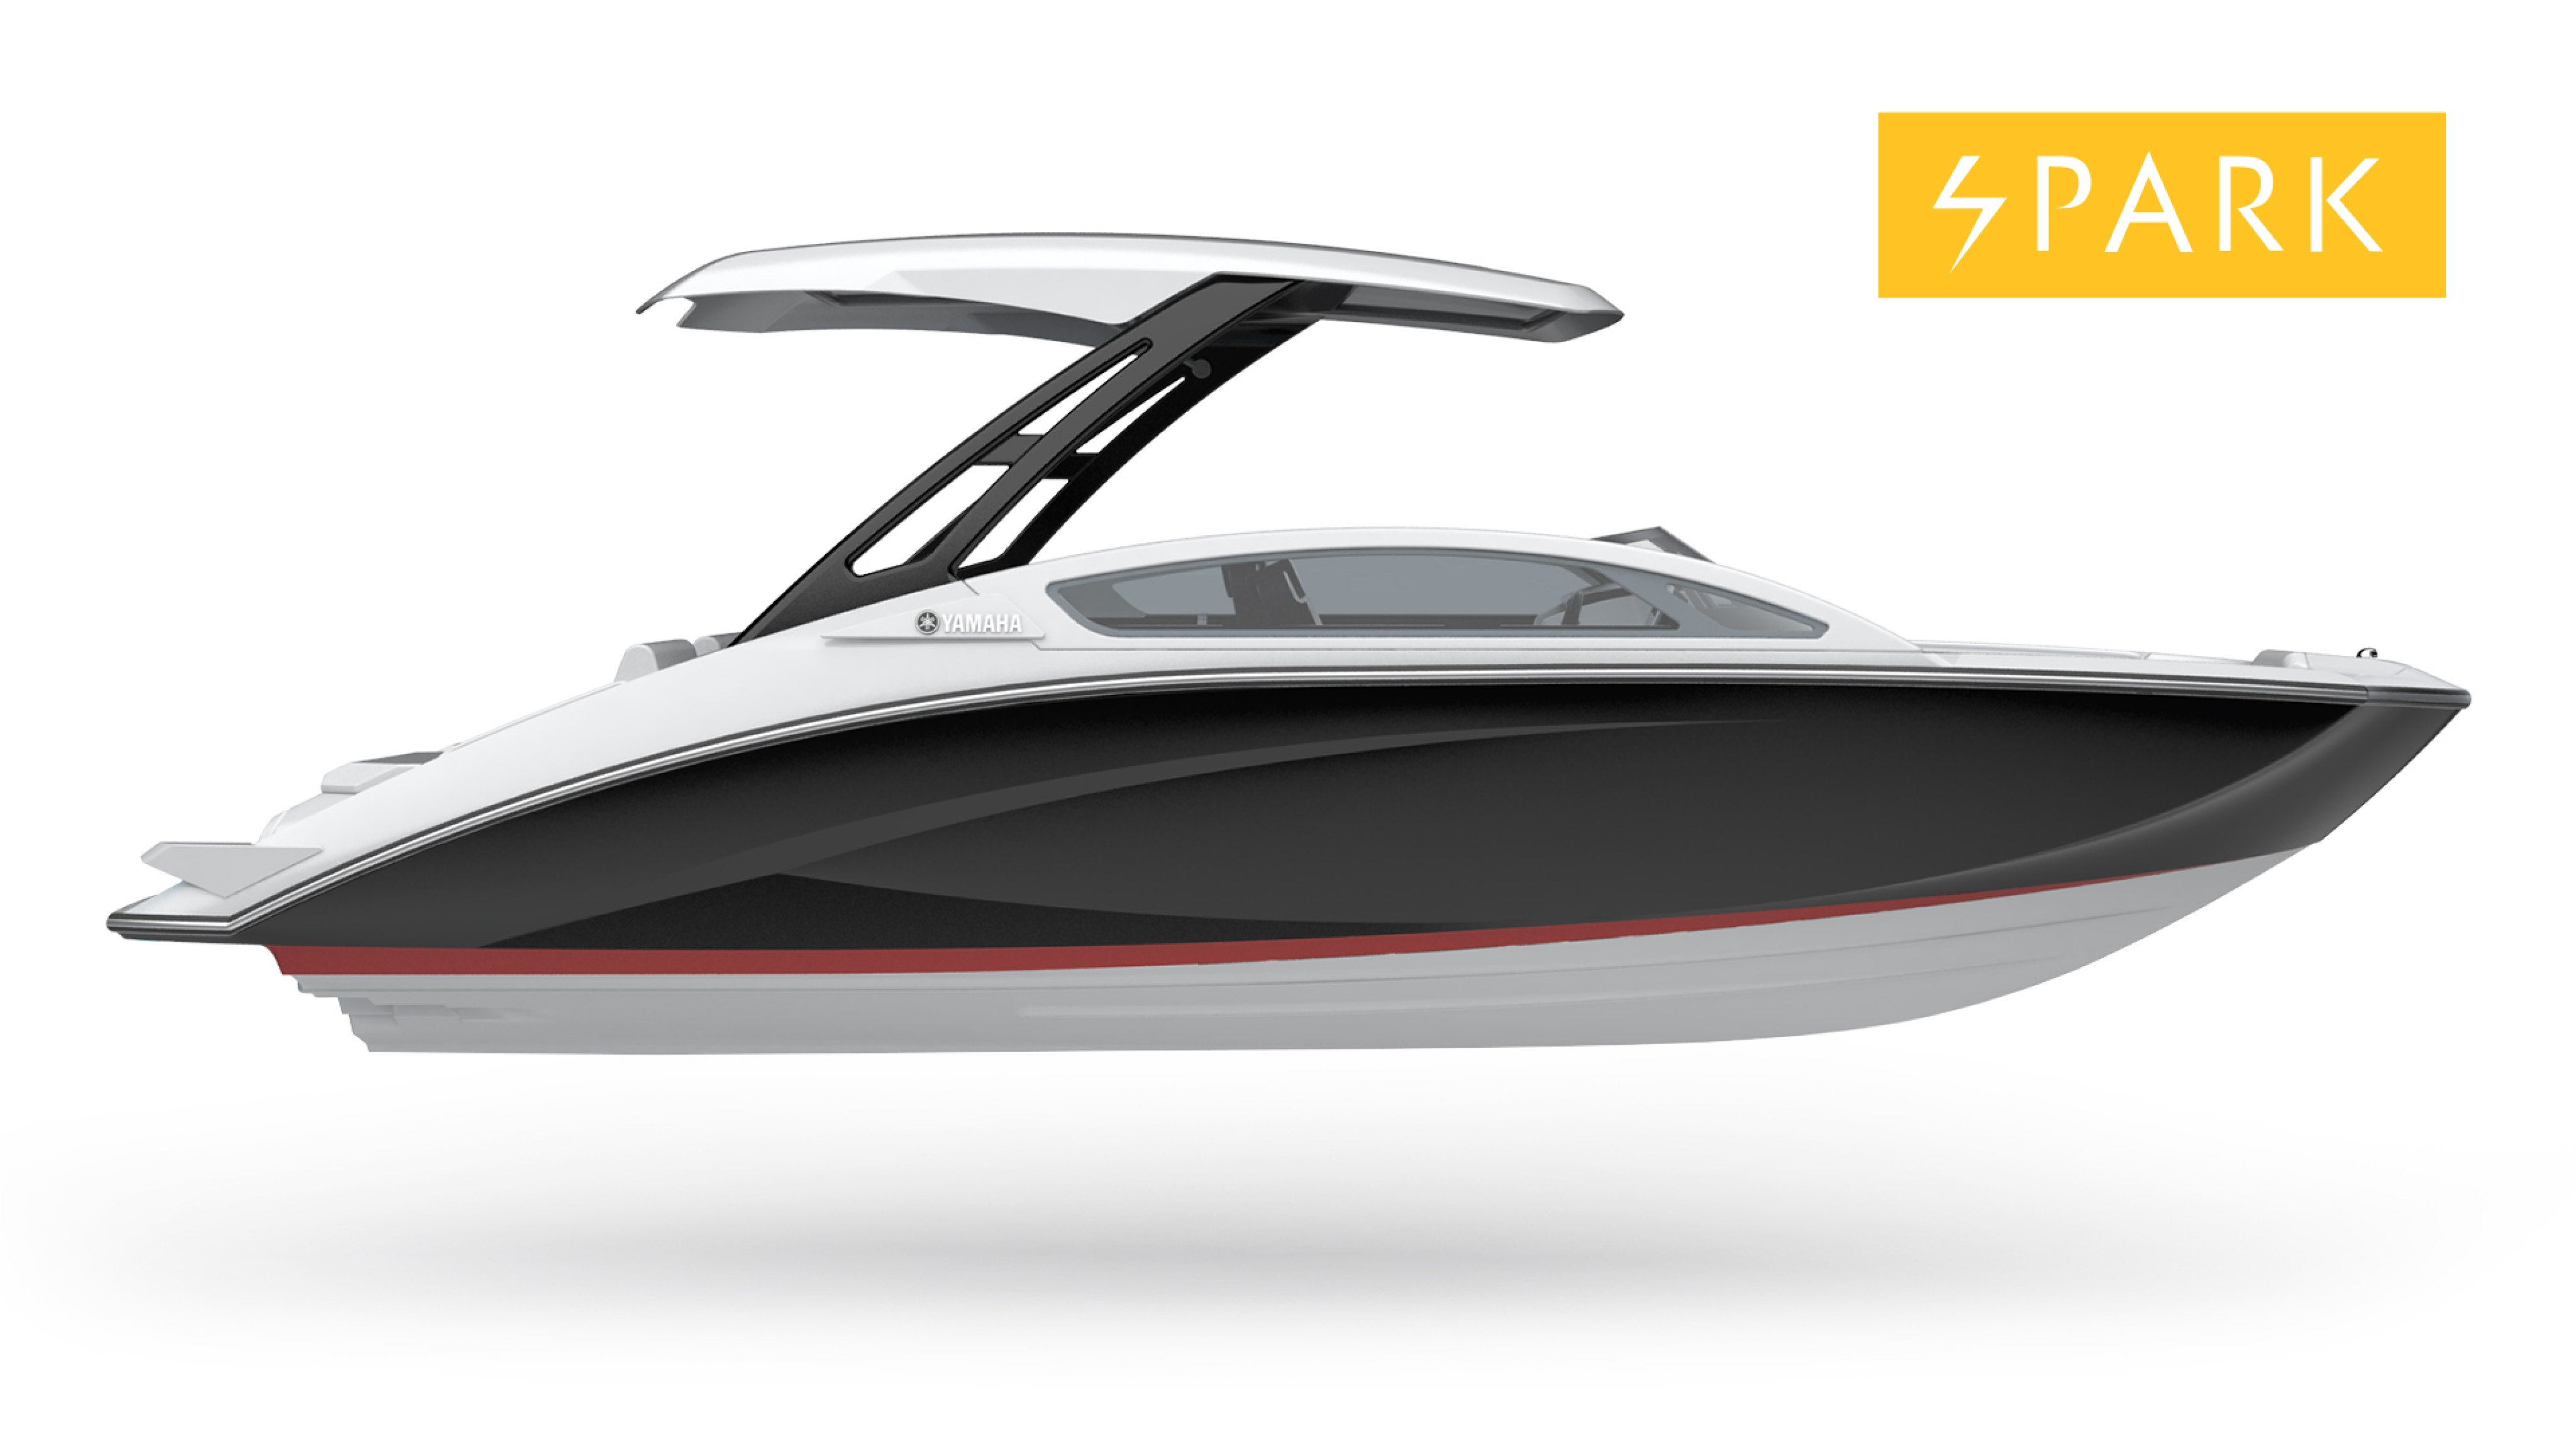 Yamaha 275 Jet Boat Spark Design Award Winner